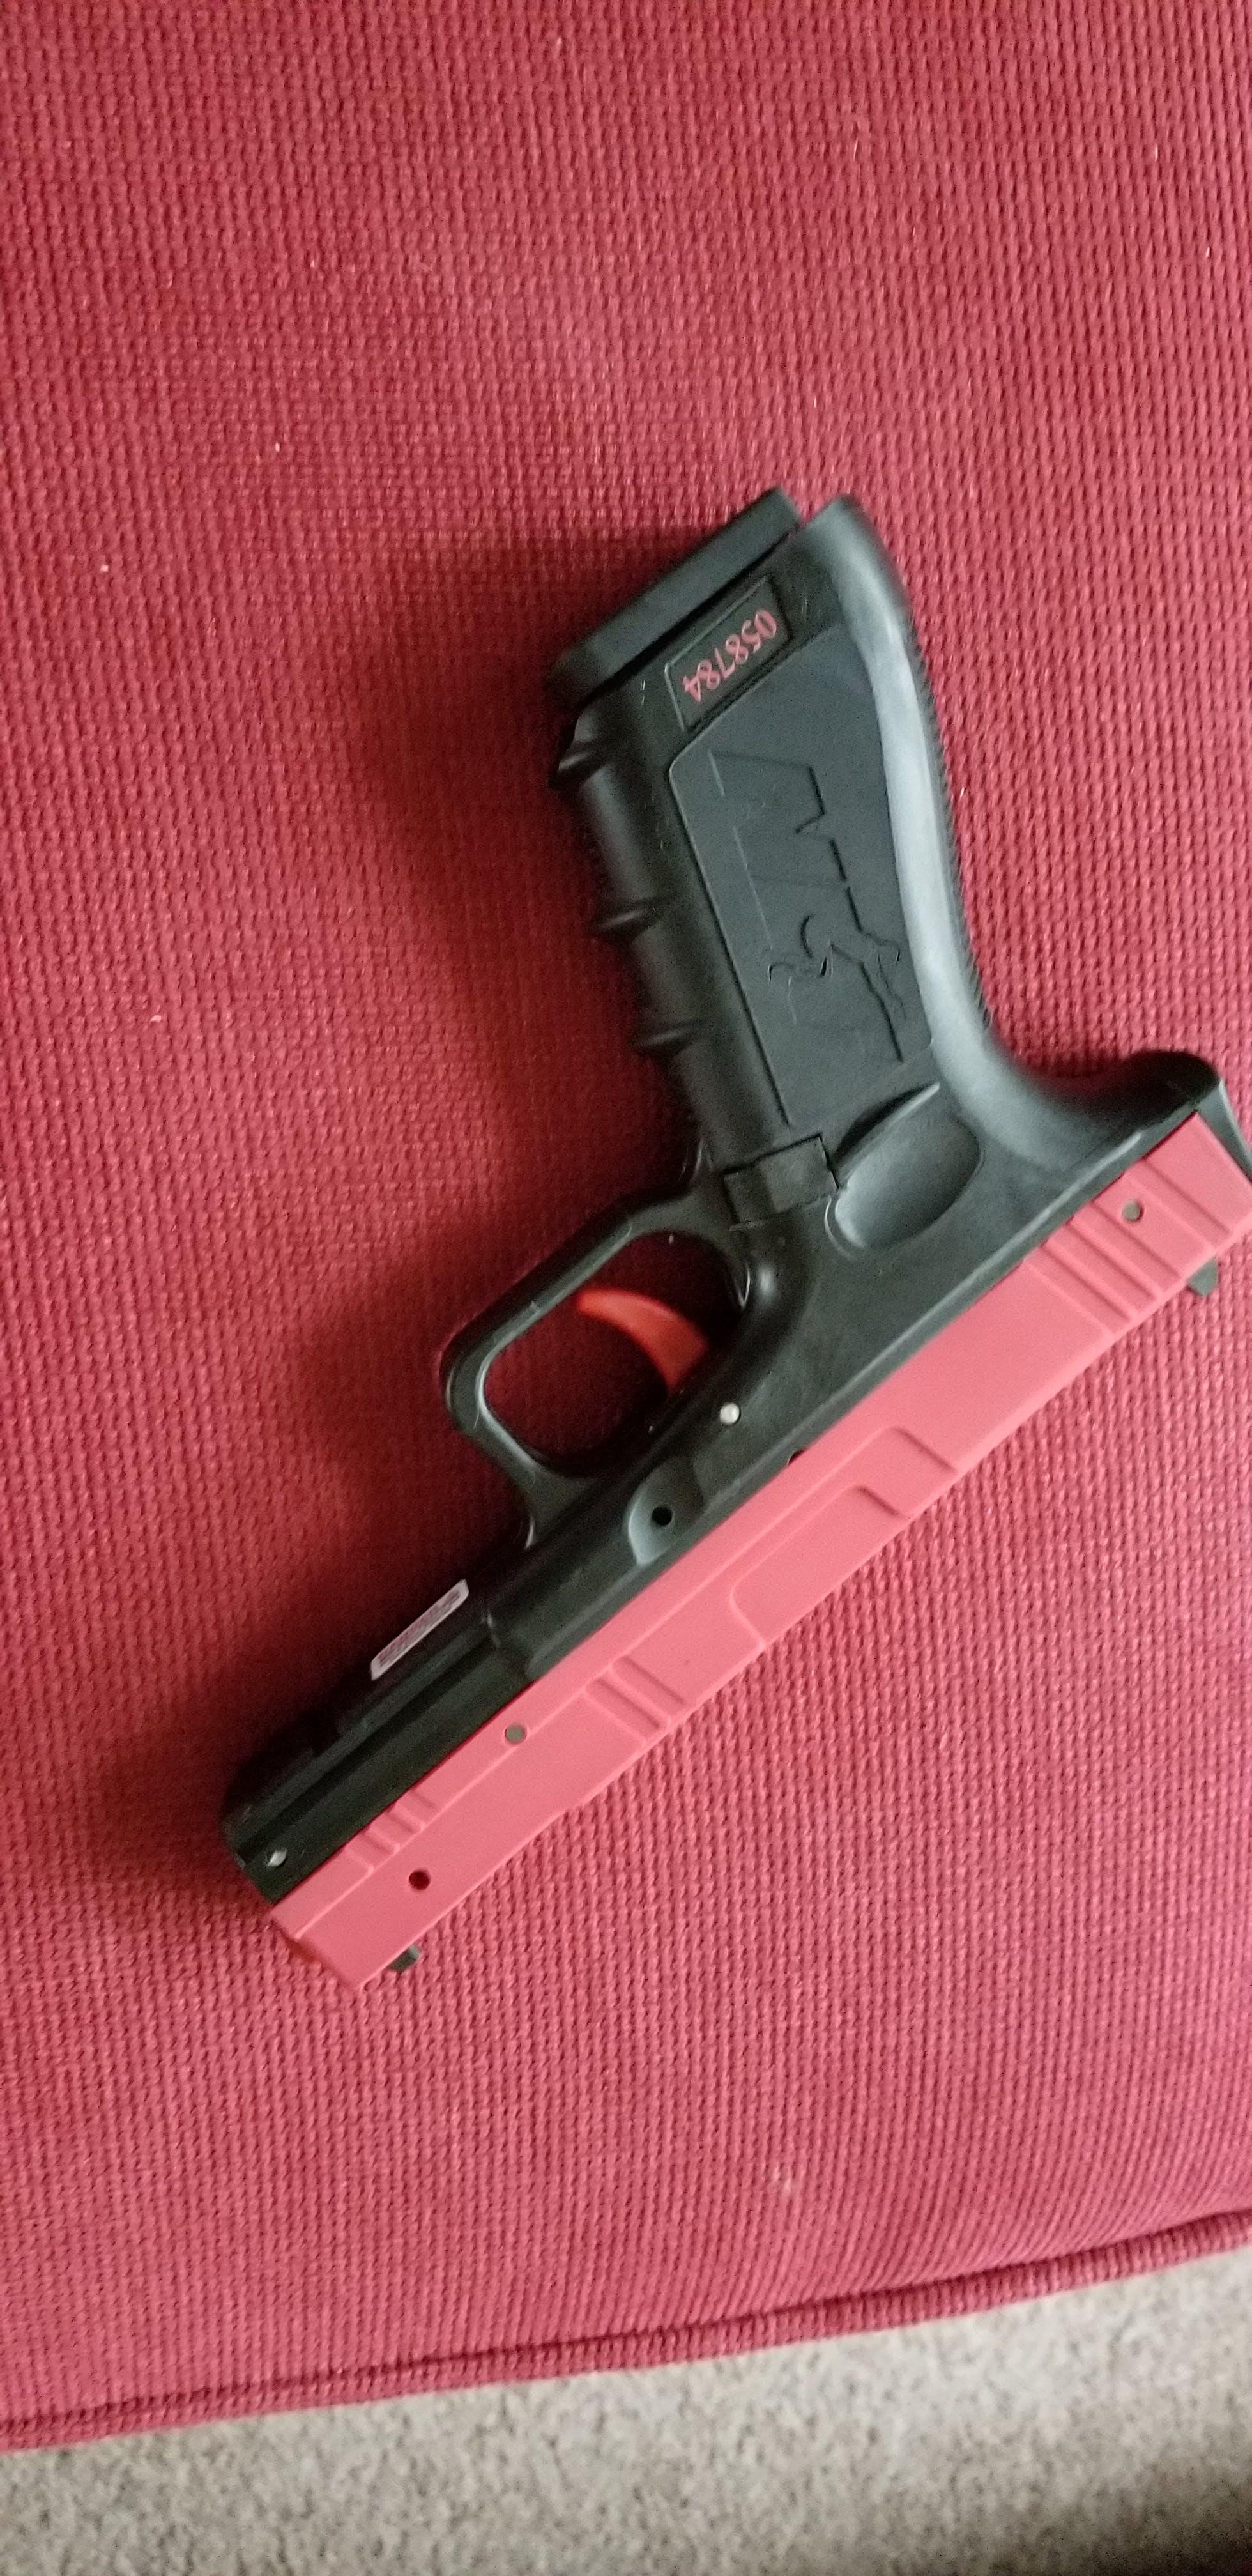 SIRT Training Pistol | Training Pistol | Gun Goddess